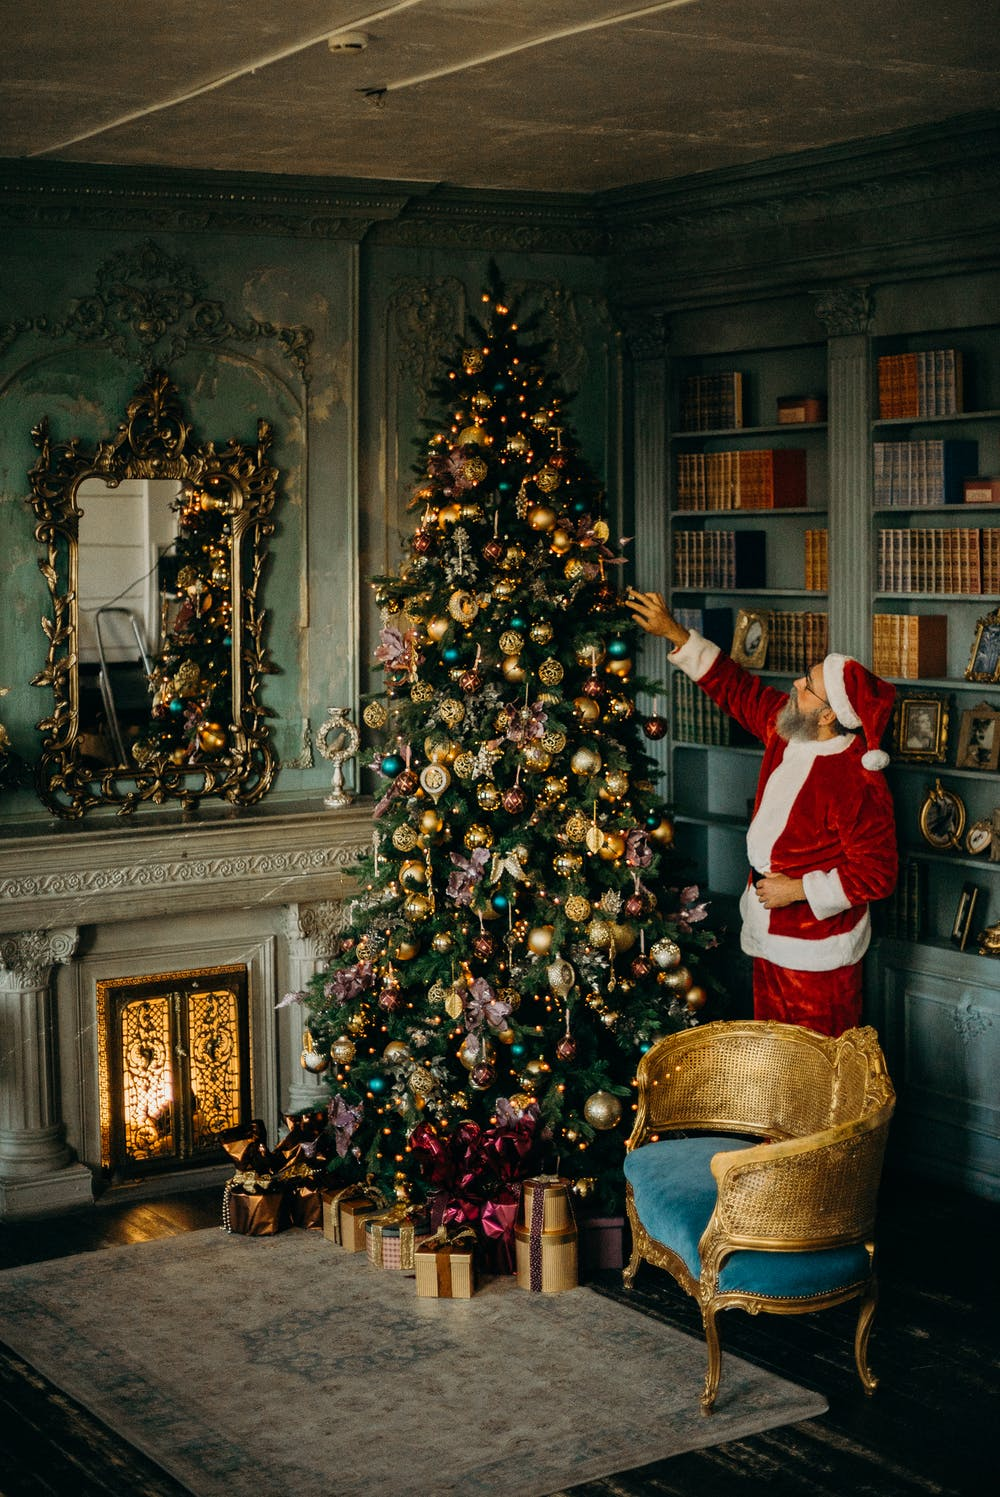 Santa Claus standing beside a Christmas tree. | Photo: Pexels